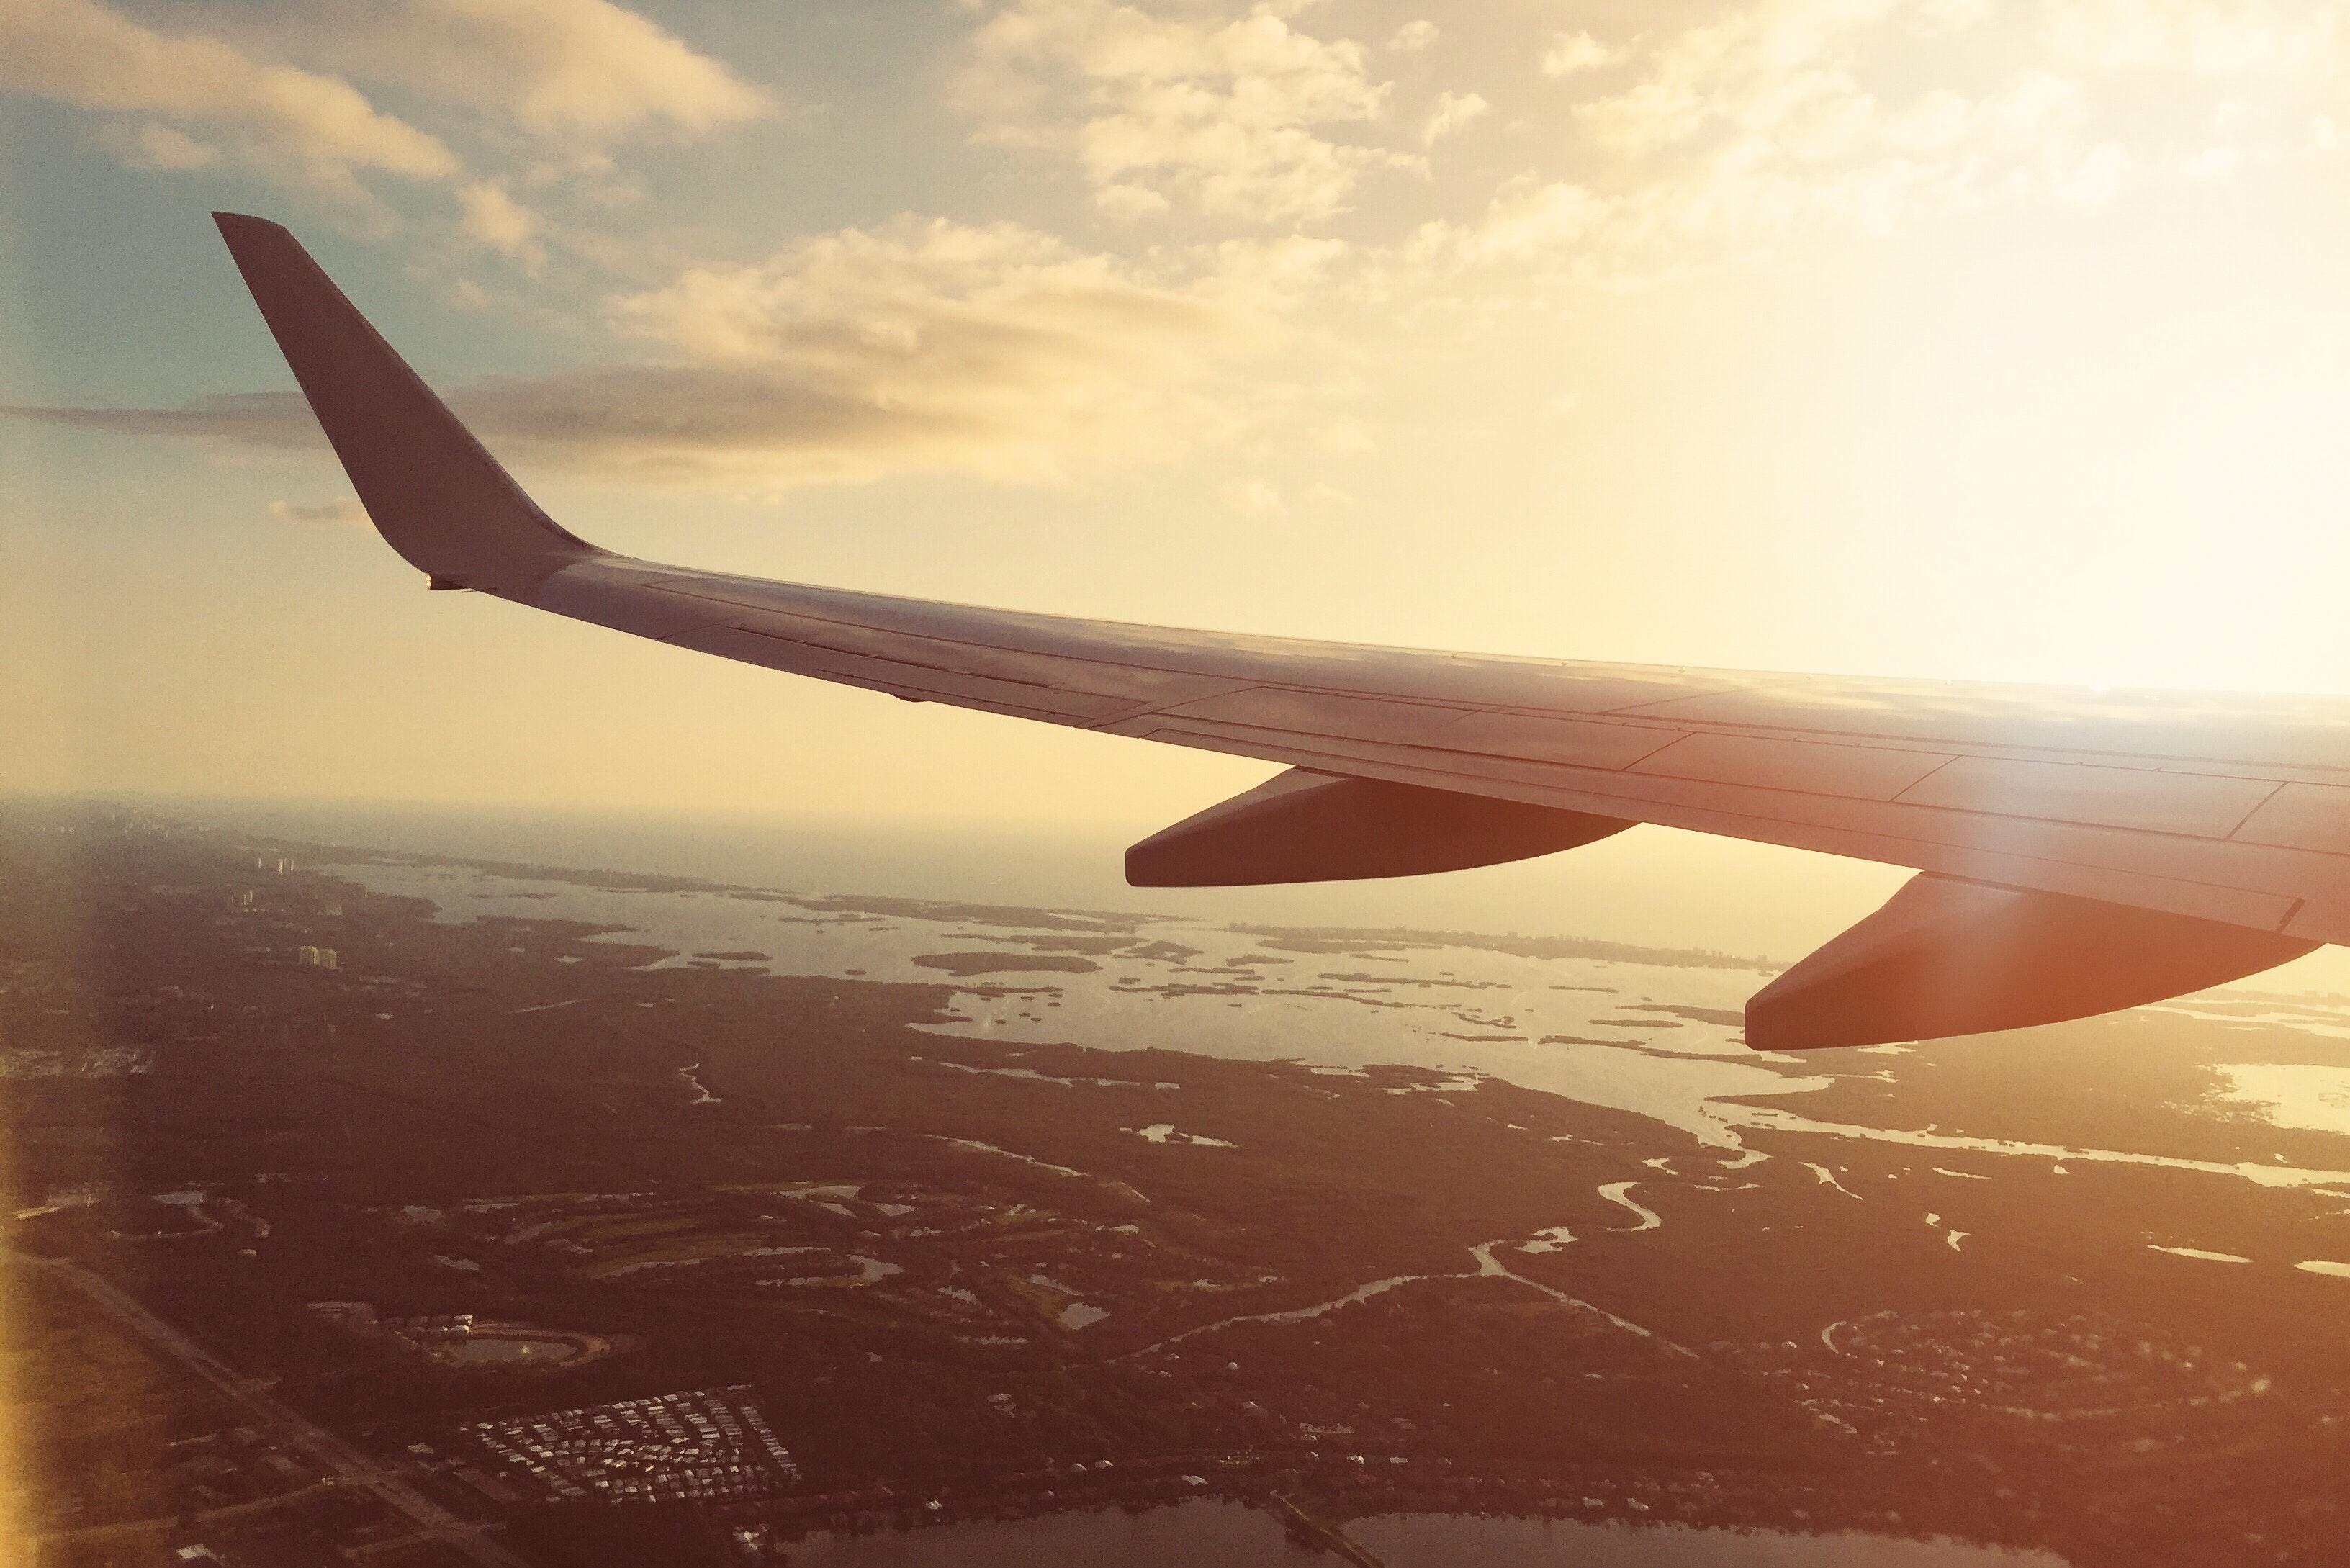 Performance de aeronaves a jato: Subida